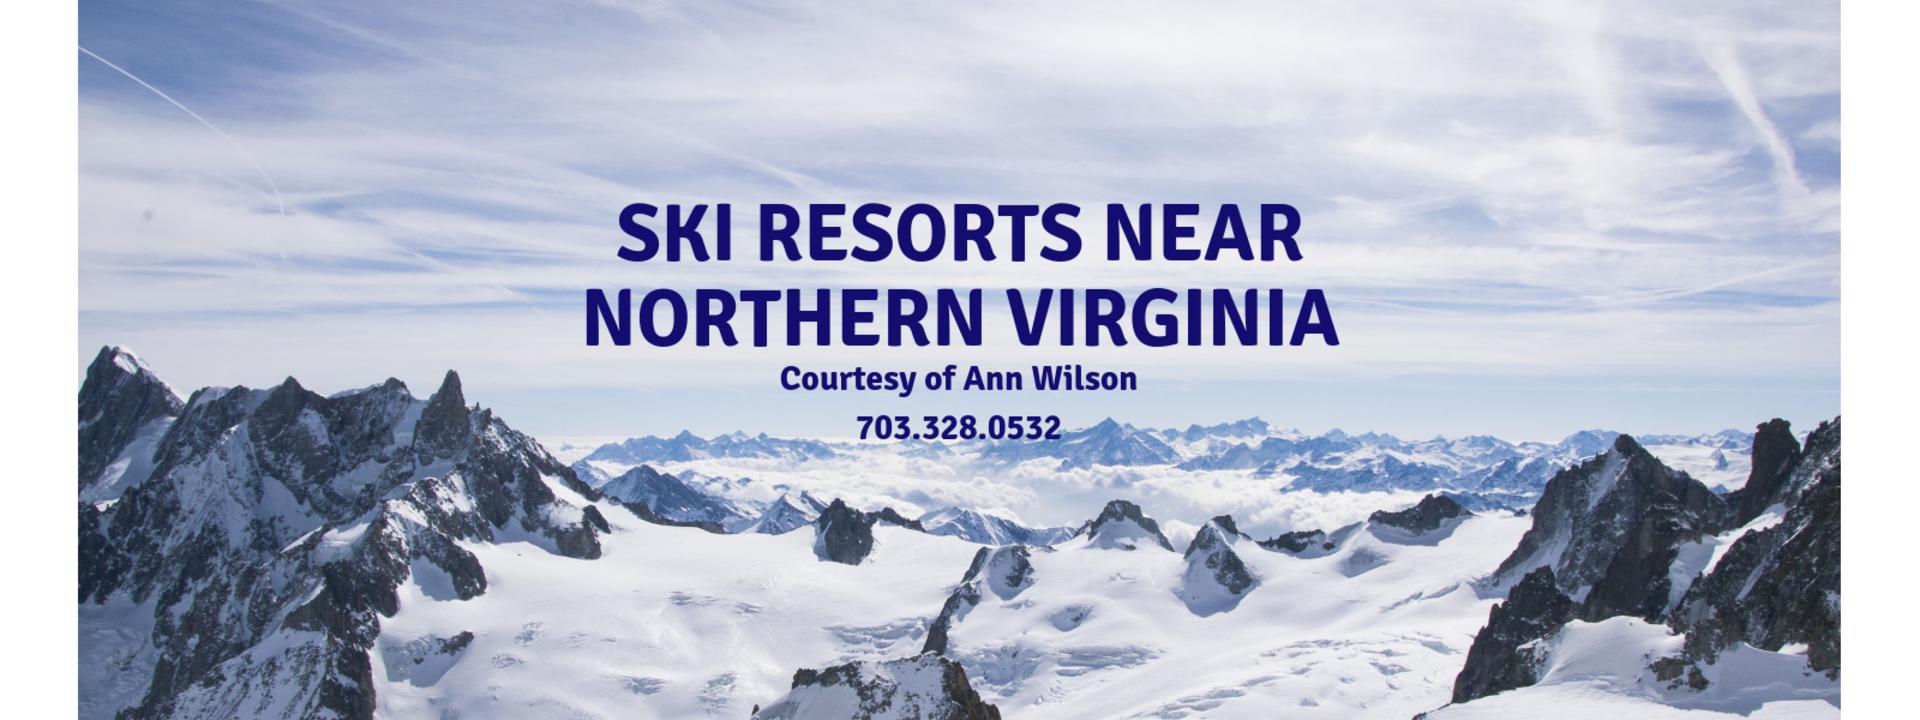 Ski Resorts Near Northern Virginia